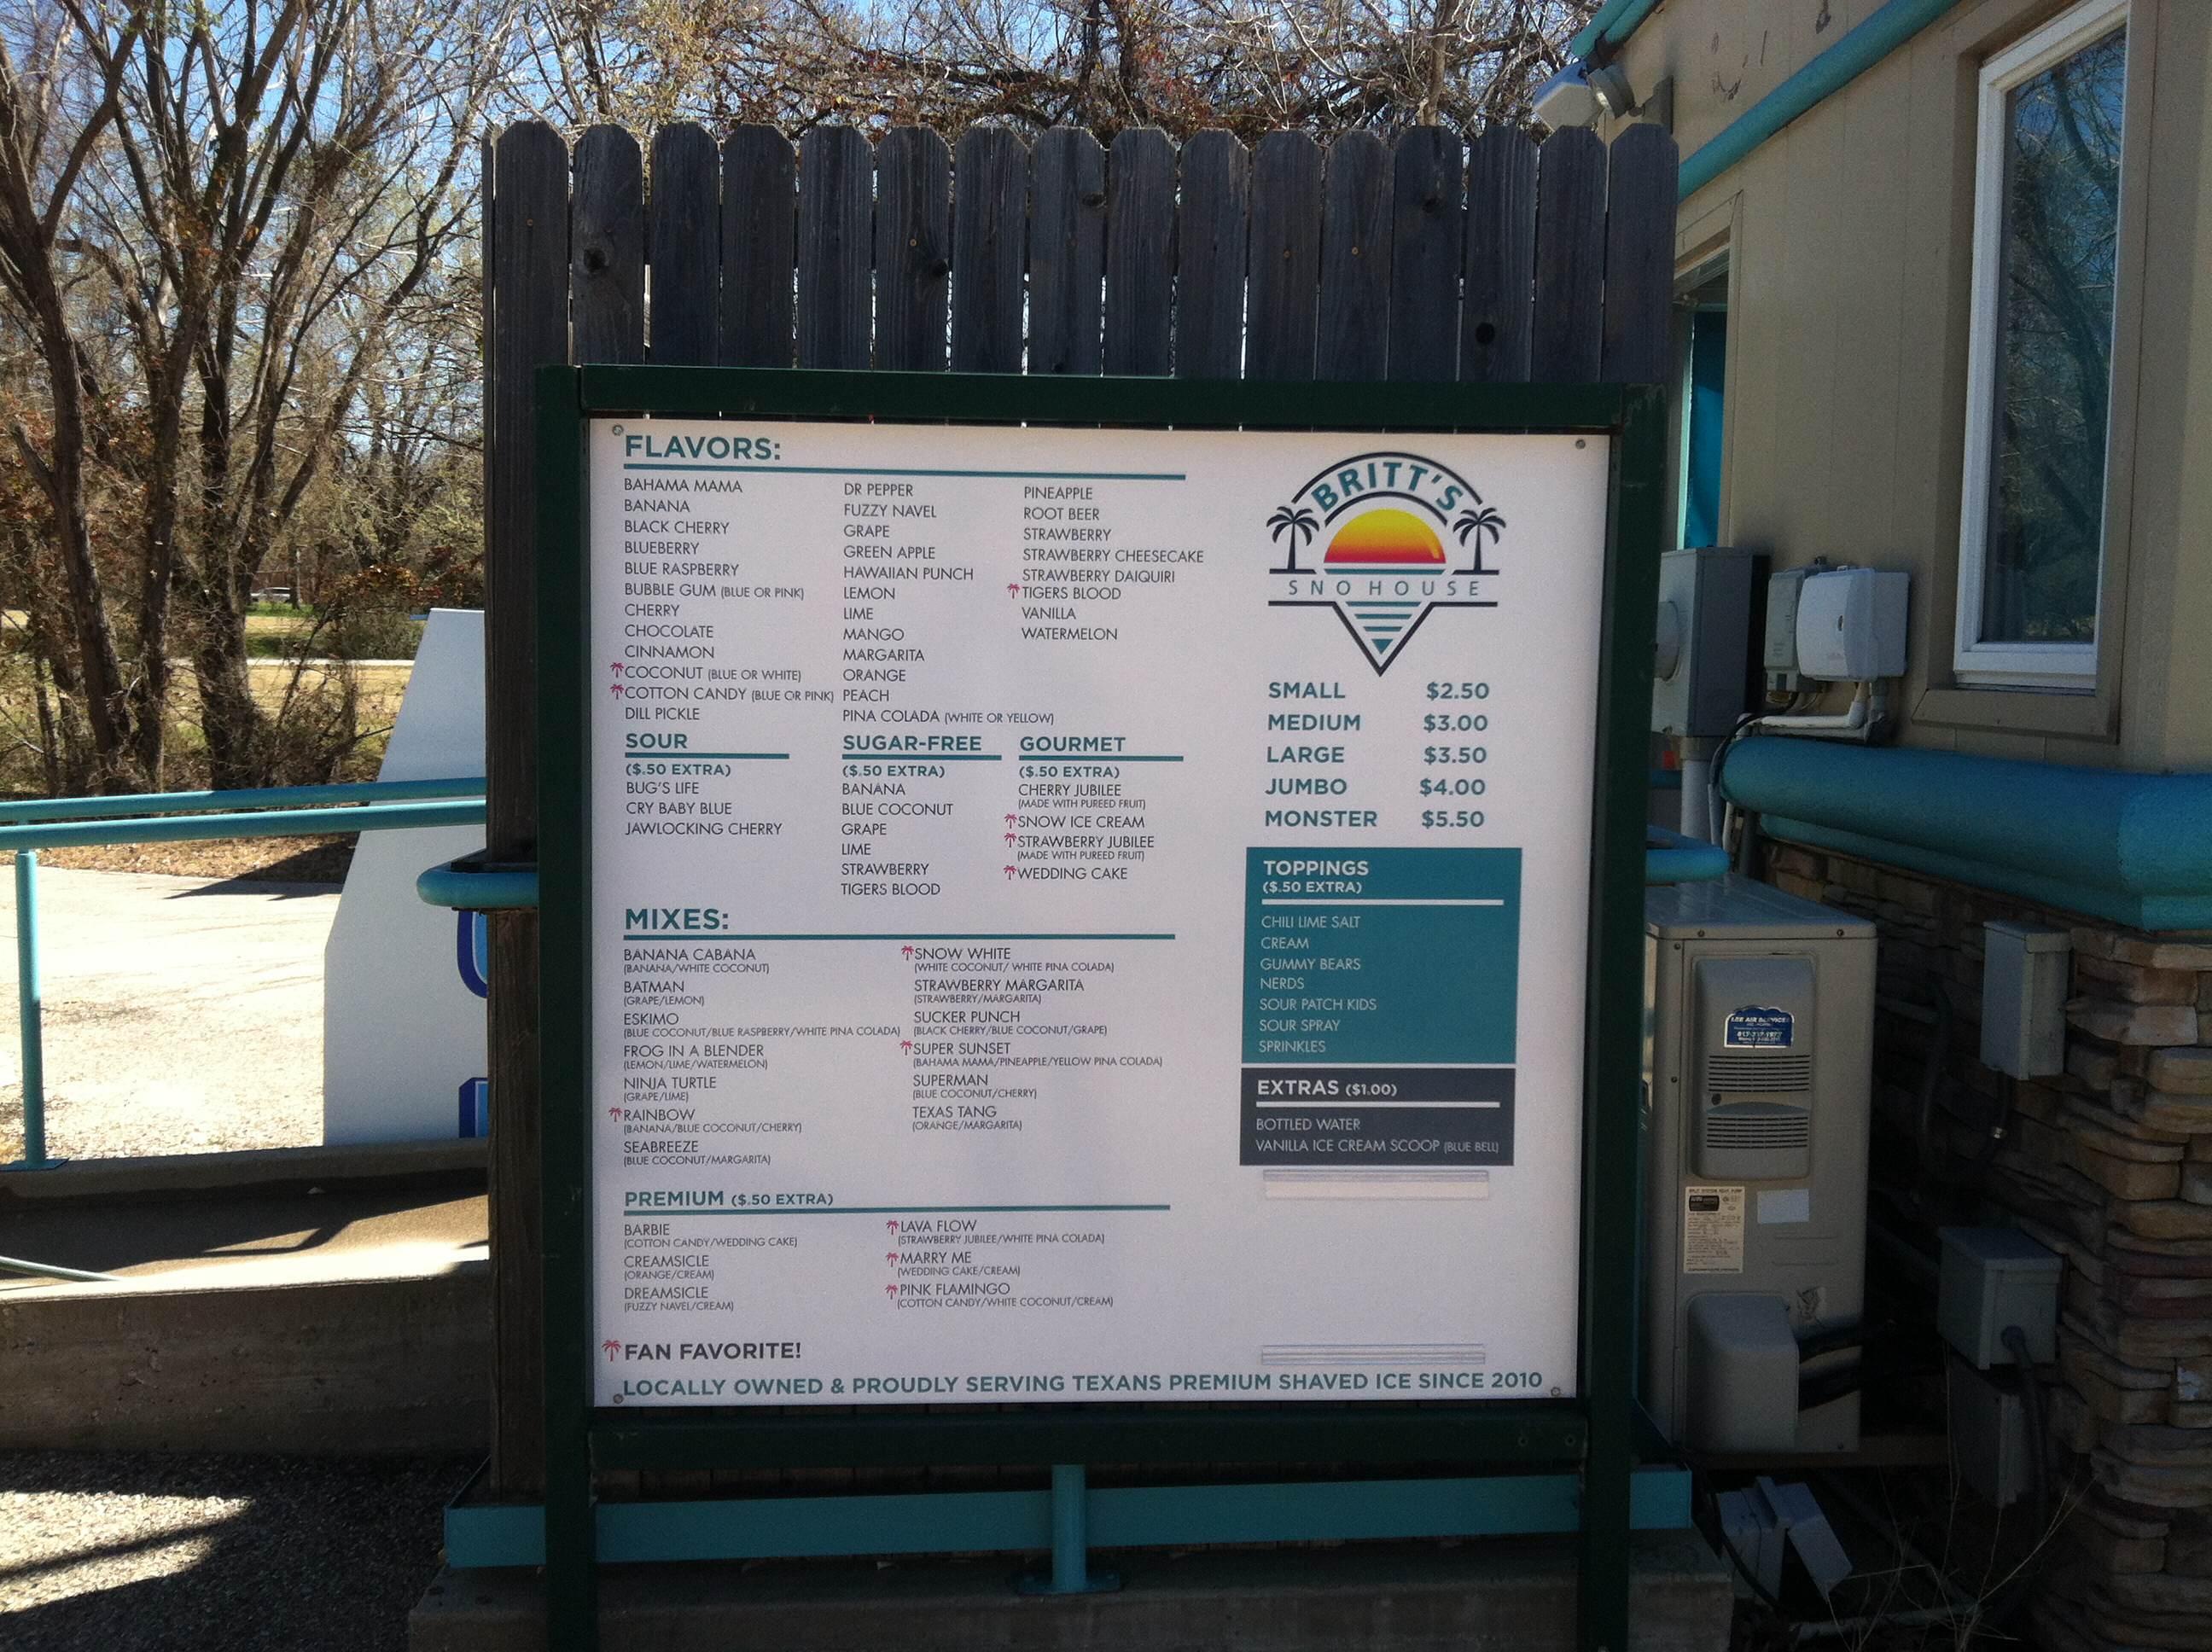 Menu Board in Colleyville TX